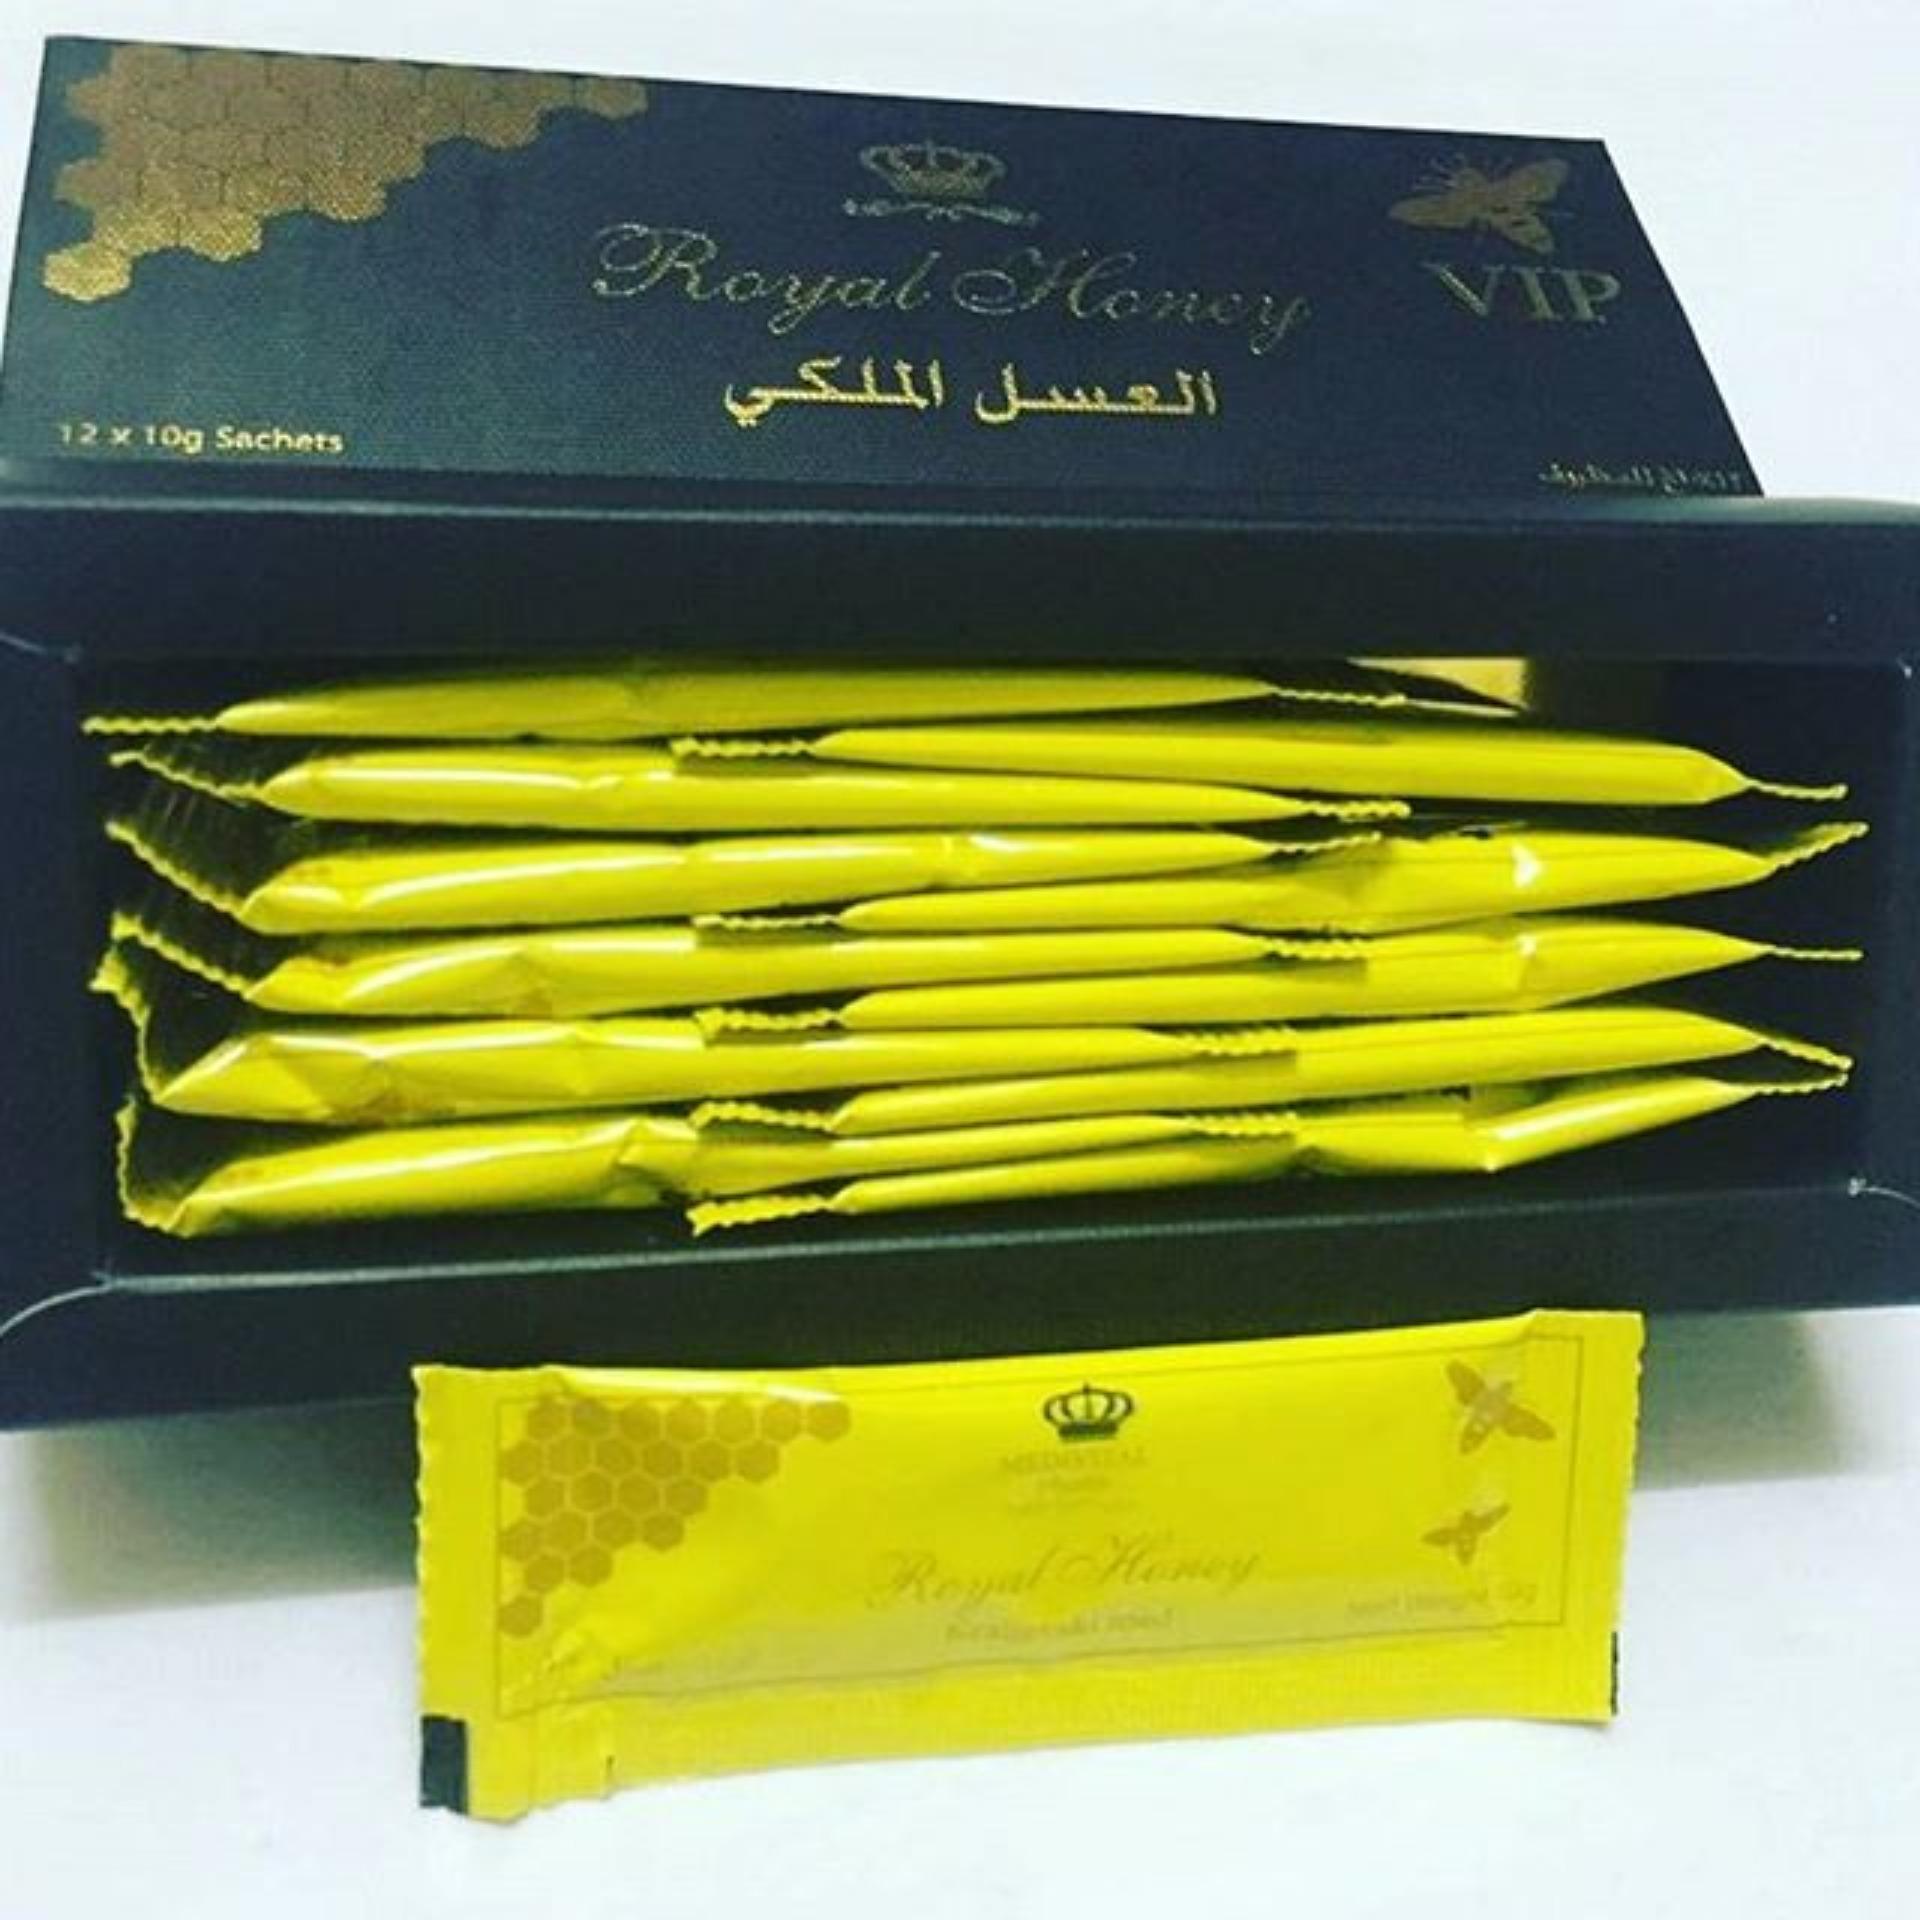 Etumax Royal Honey For Him Male Sexual Wellness 10g x 12 sachets